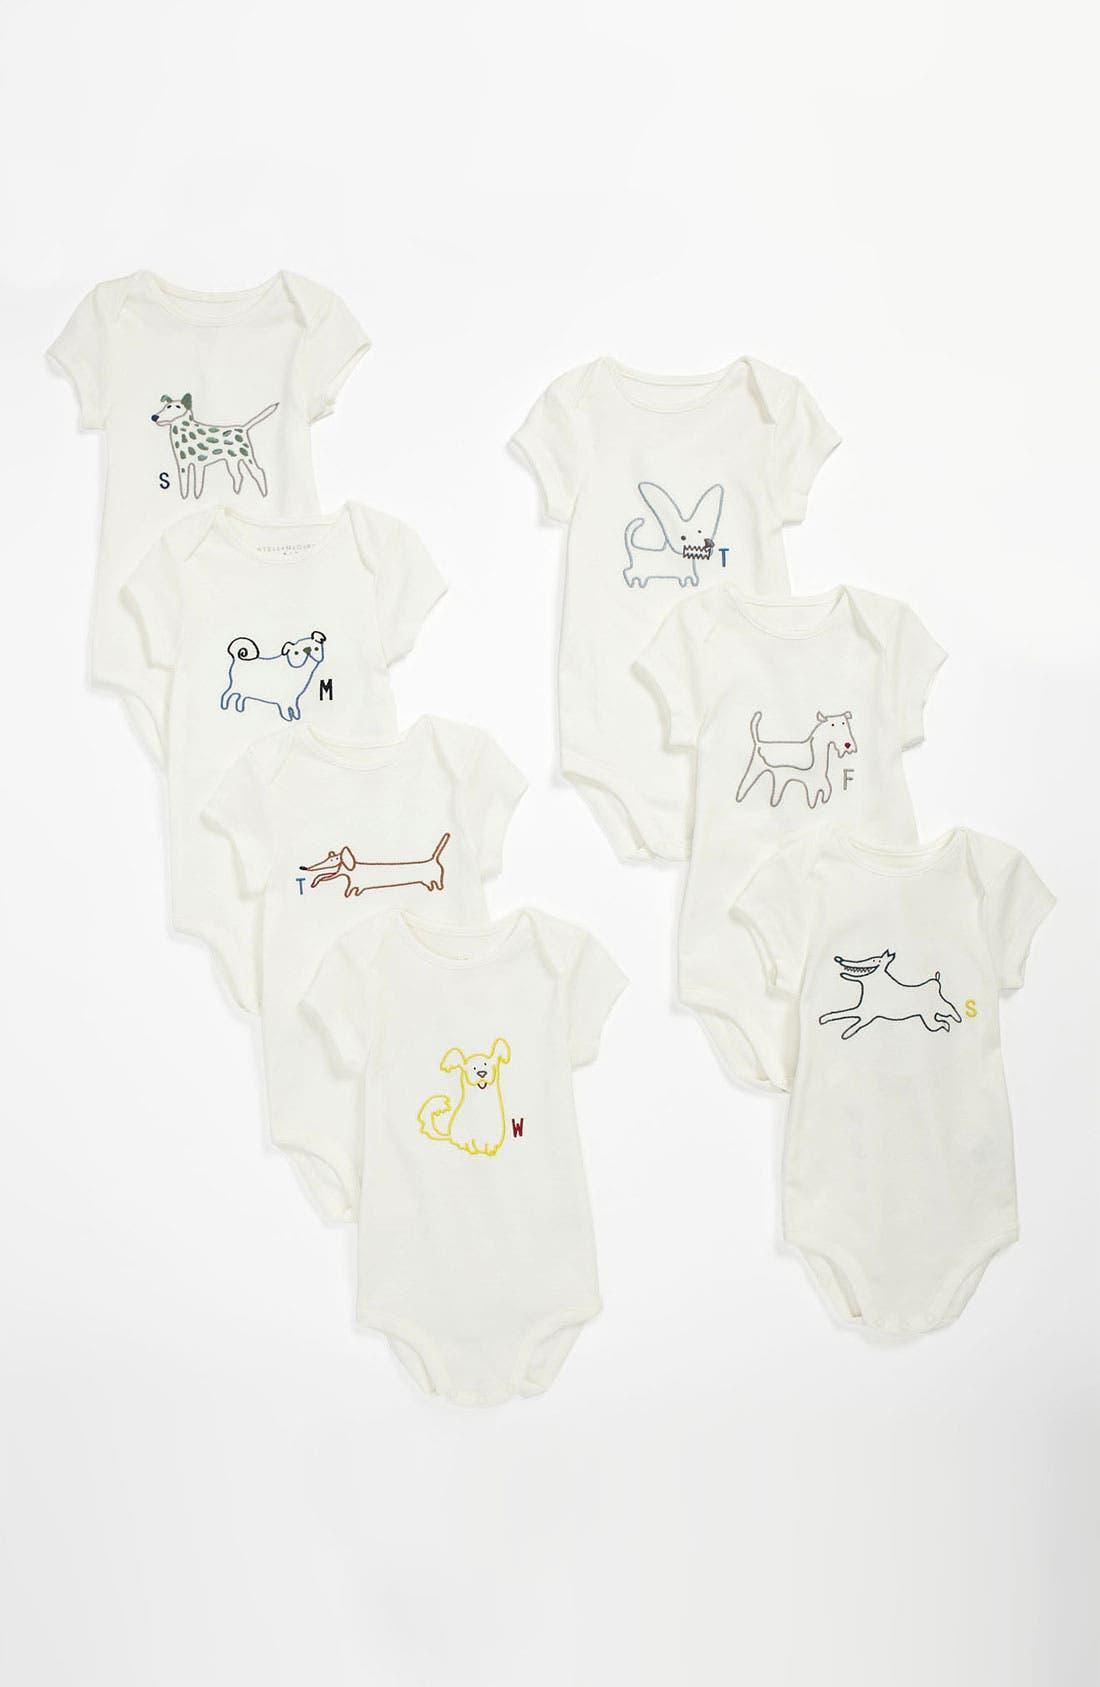 Main Image - Stella McCartney 'Sammie Baby' Bodysuit (Set of 7) (Infant)